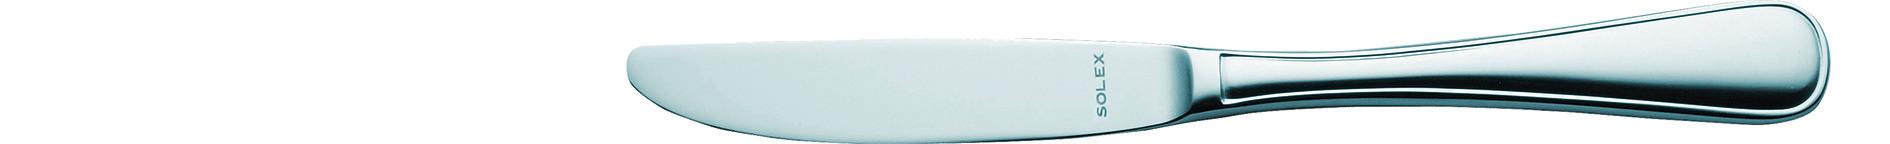 Selina, Dessertmesser Monoblock 211 mm